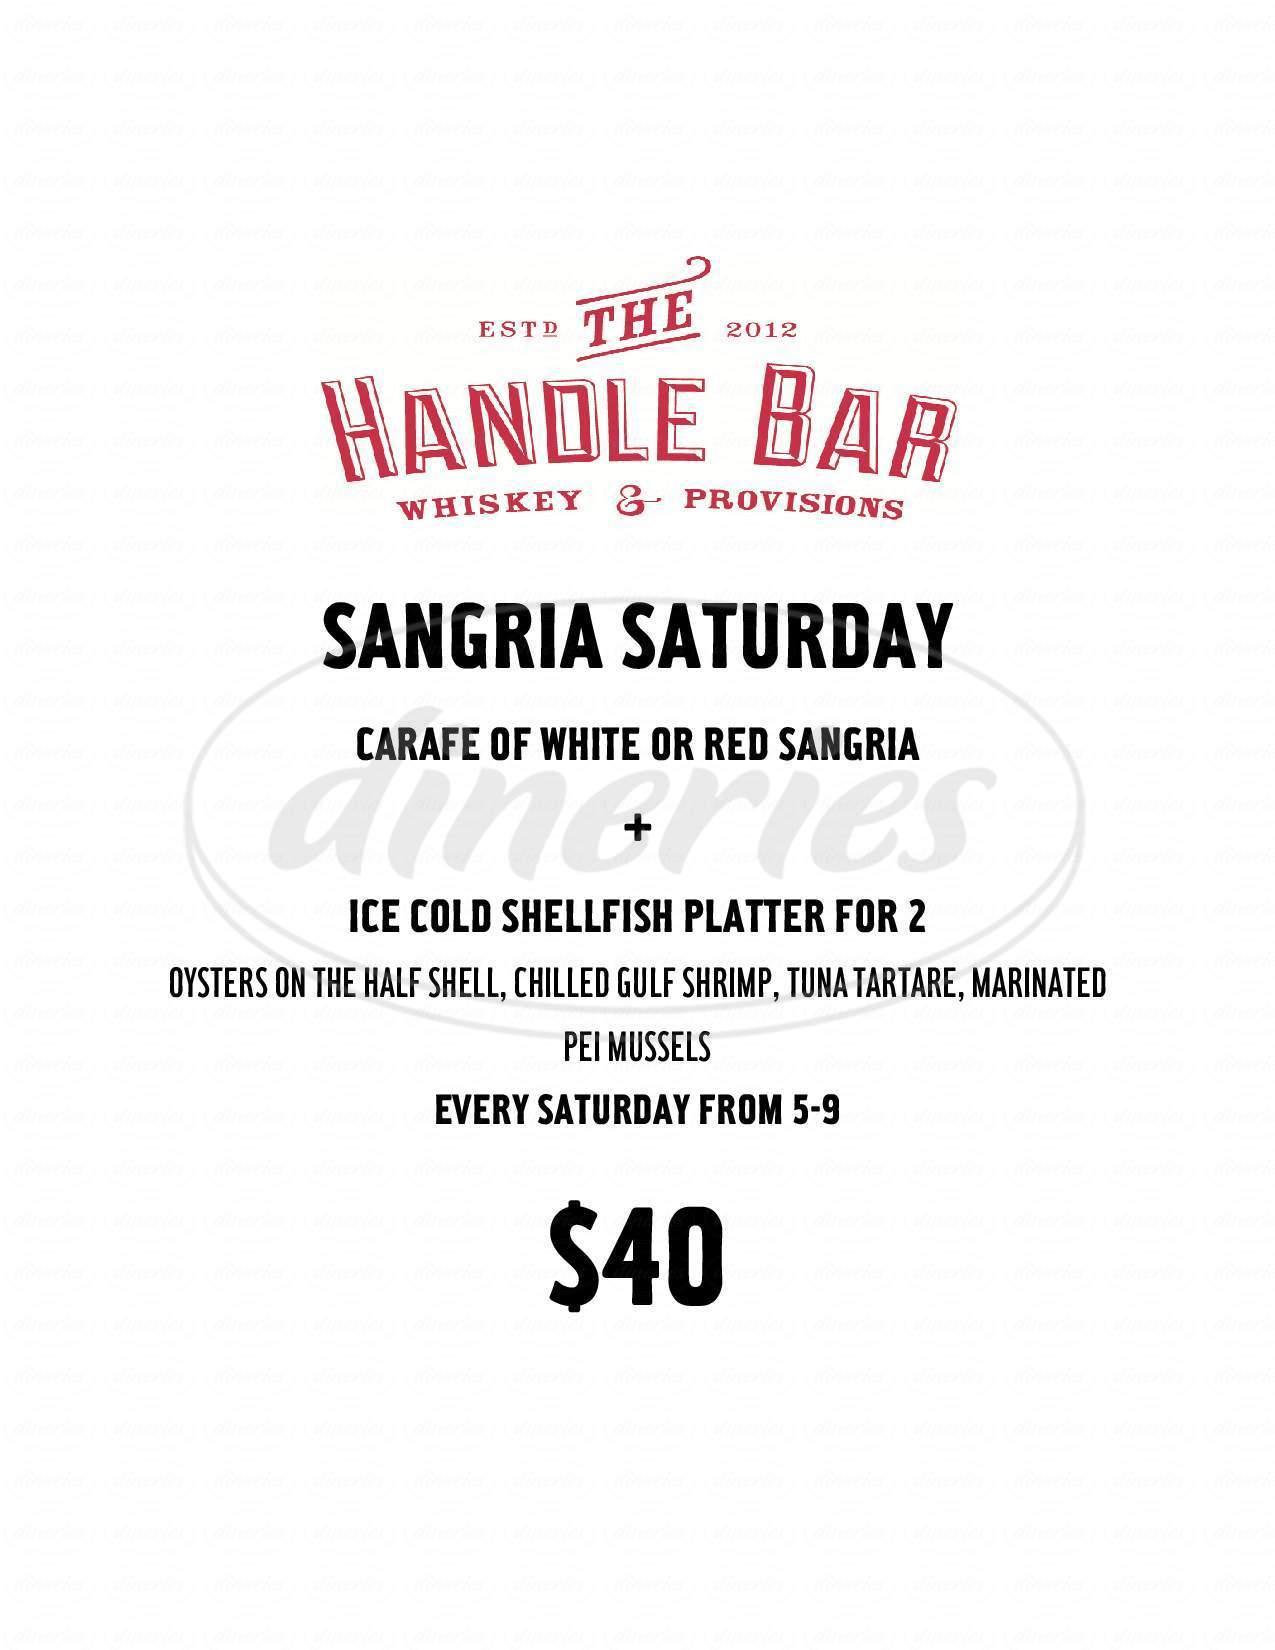 menu for The Handle Bar